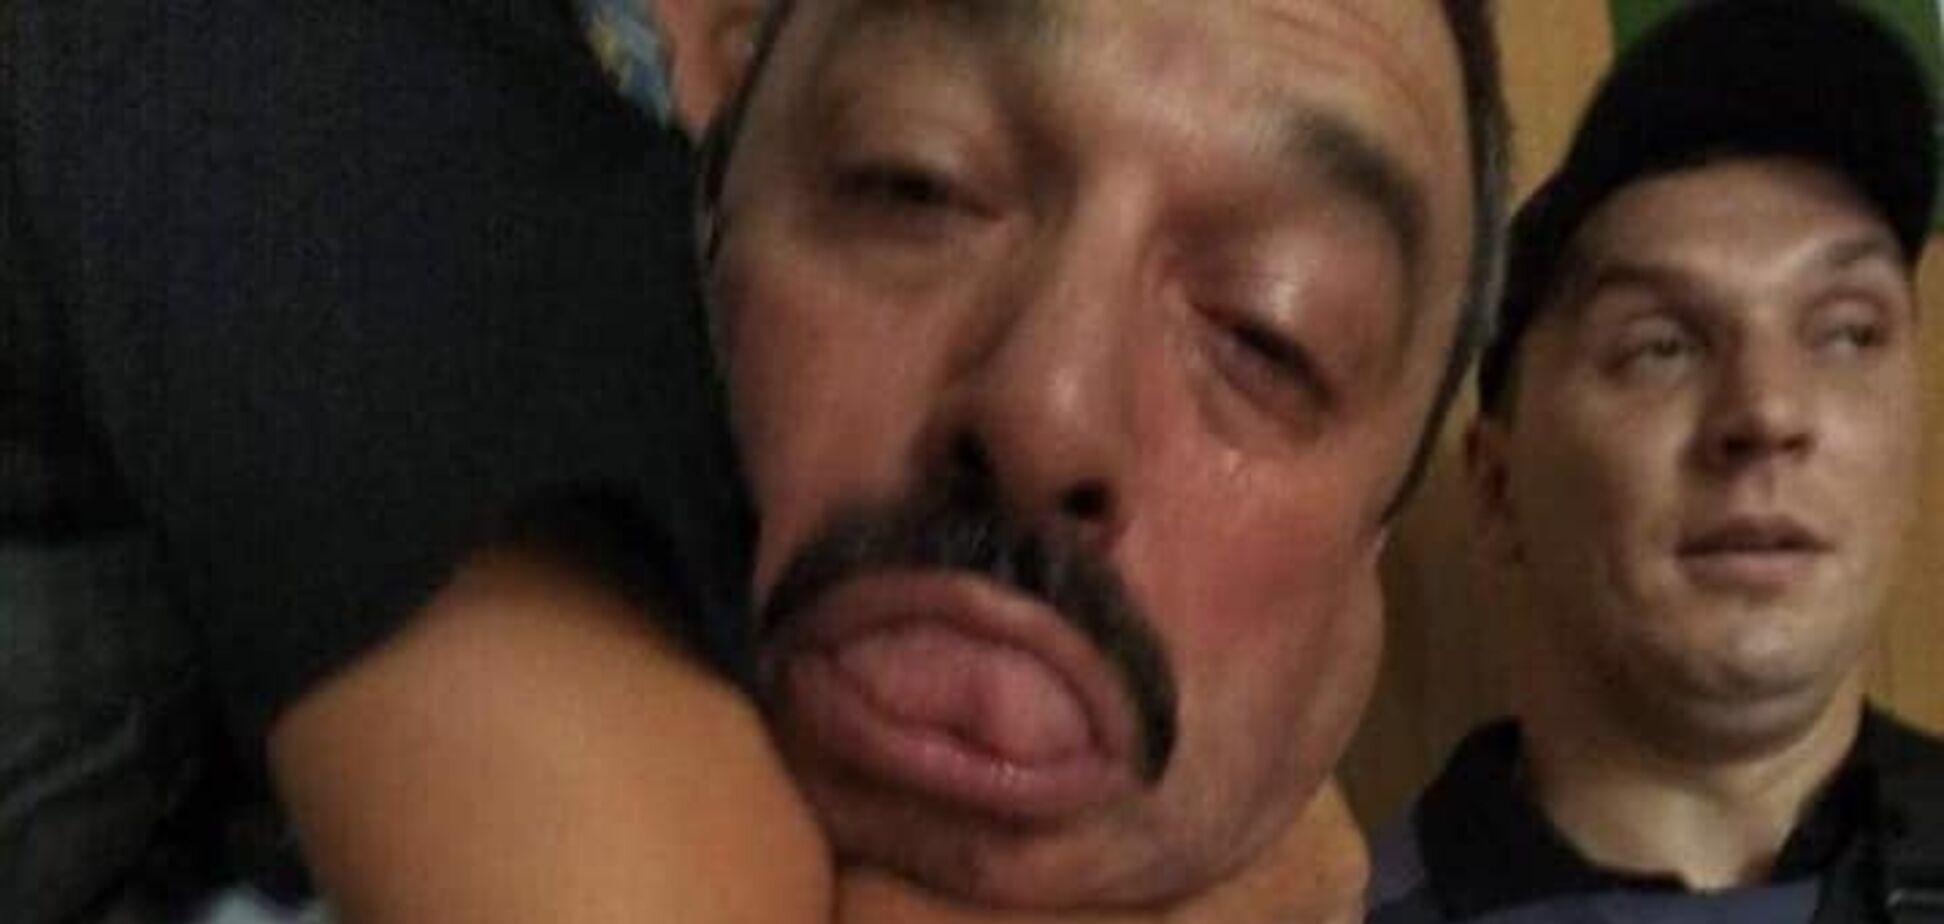 'Ему п*зда': в Днепре за тройное ДТП задержали майора полиции